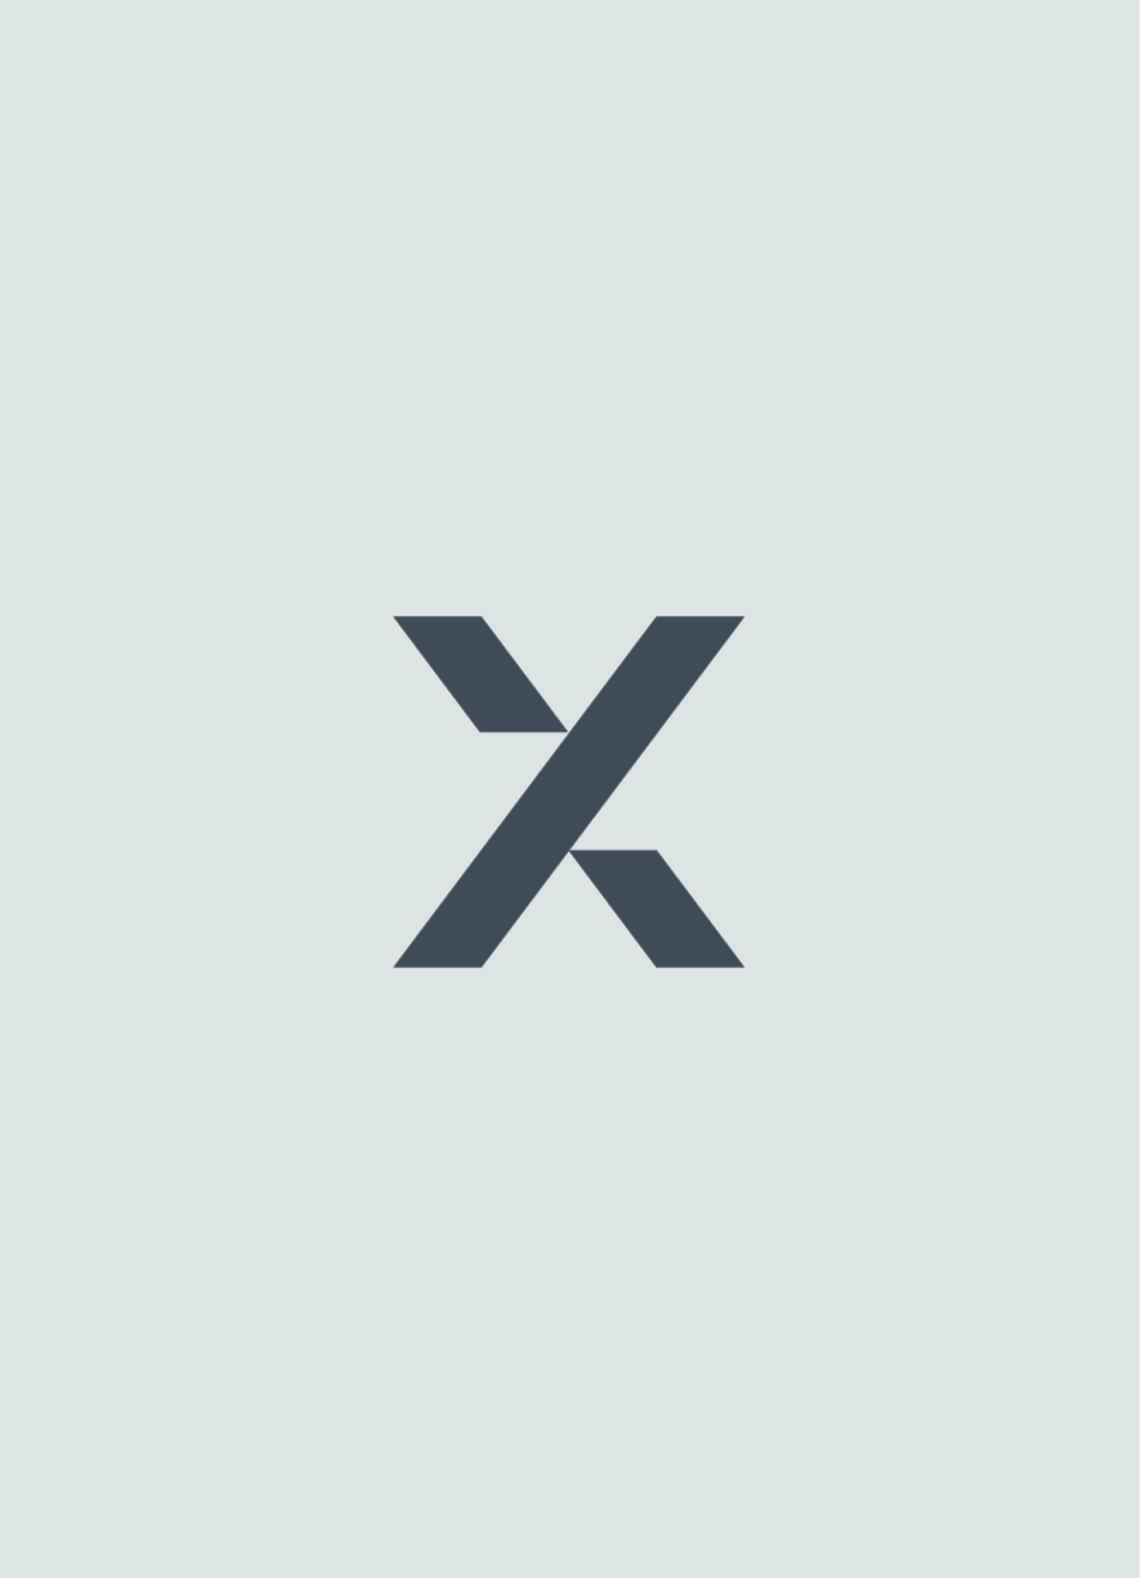 fenix-ntm_139_001.jpg